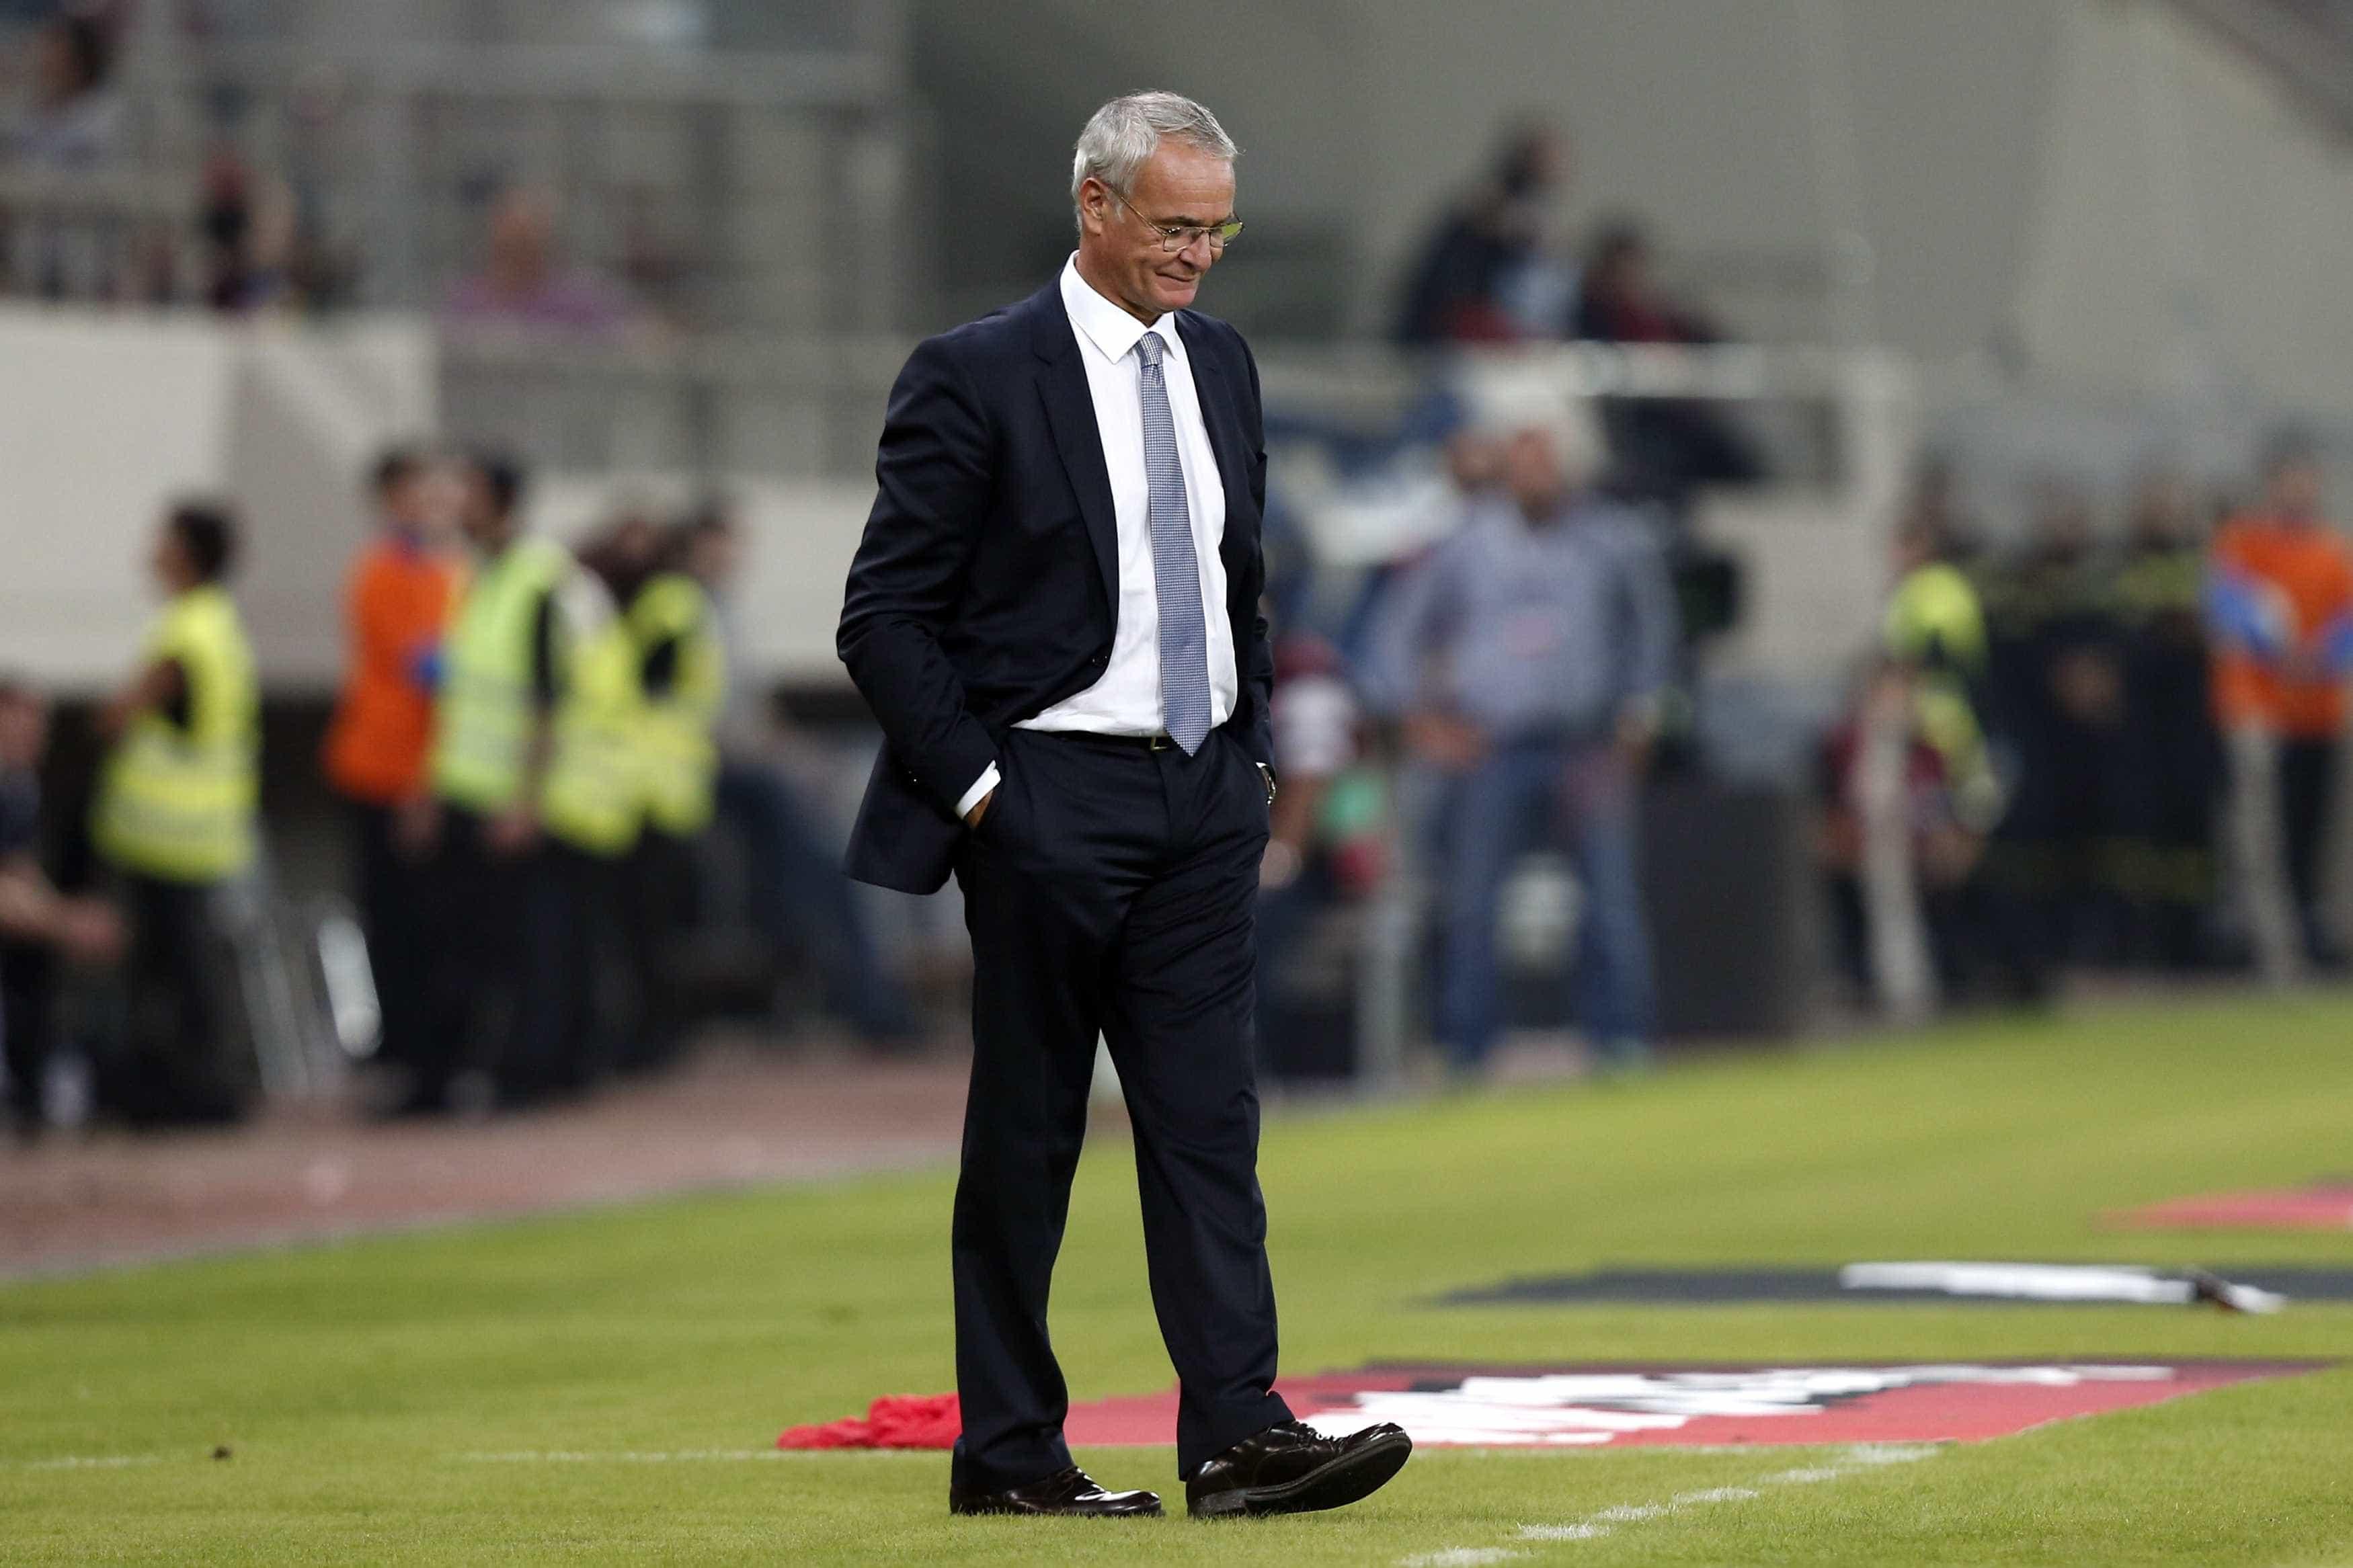 The Sun revela que despedimento de Ranieri está relacionado com andebol